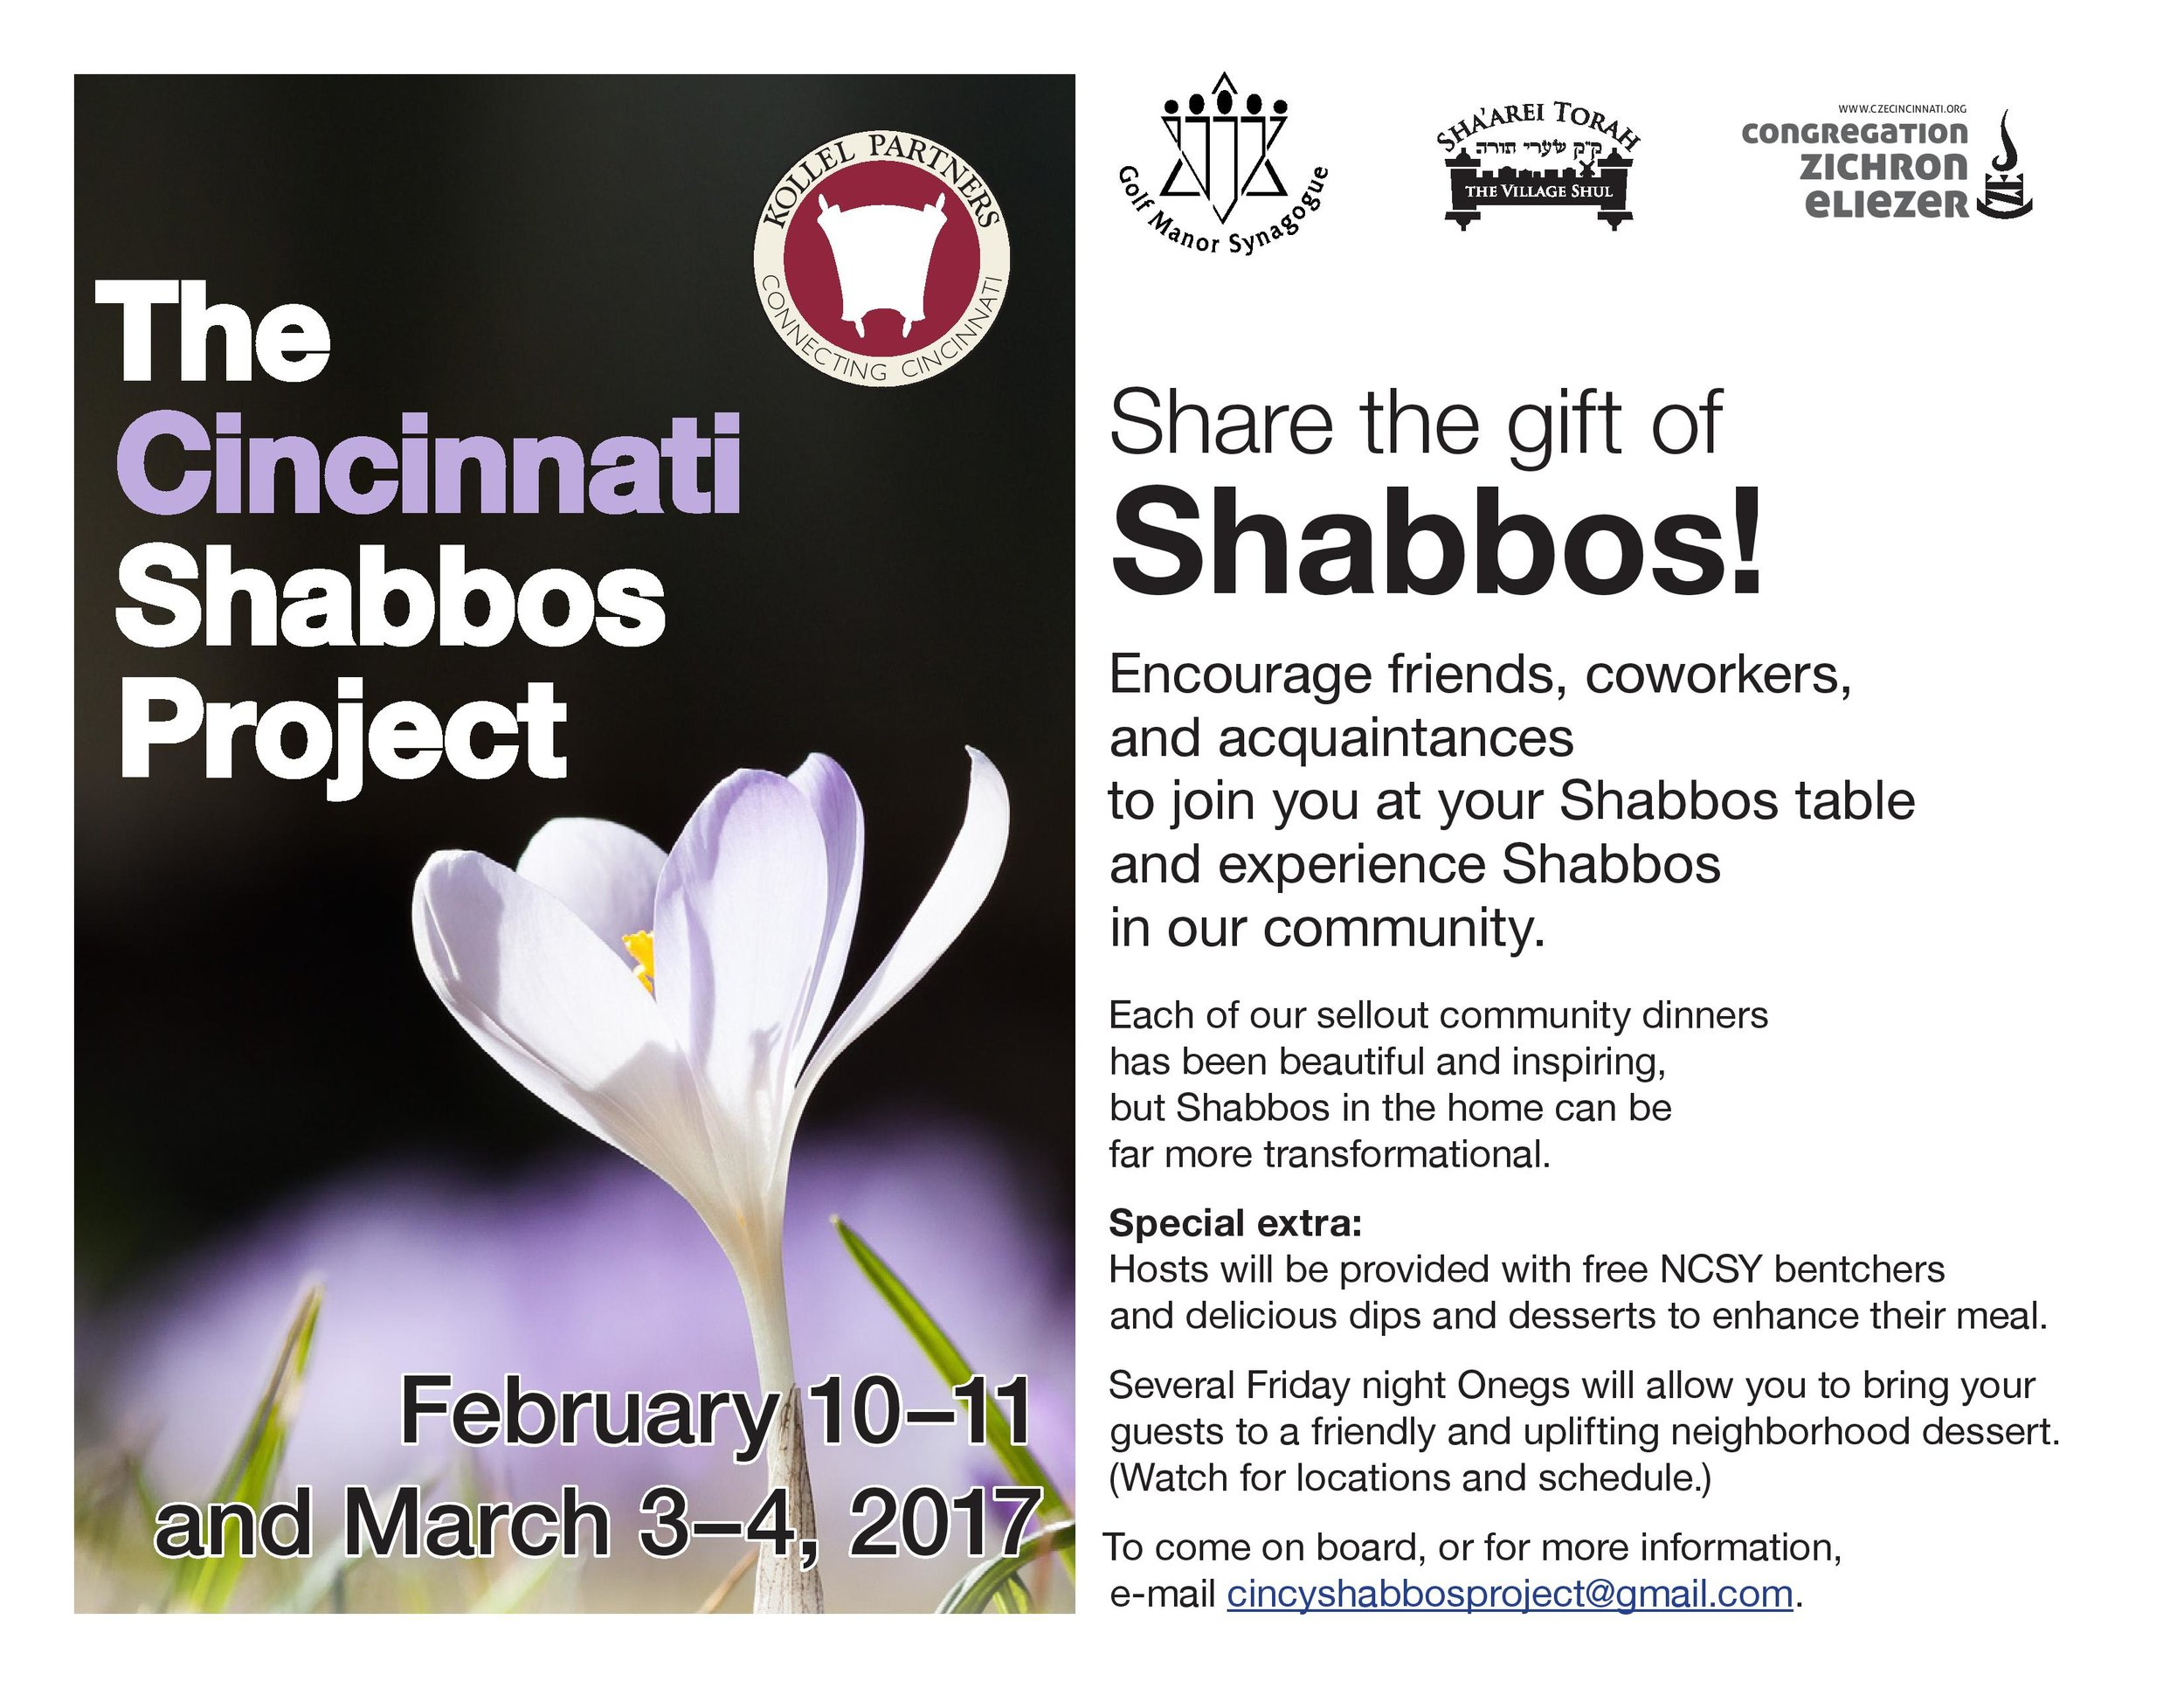 shabbos_host_info